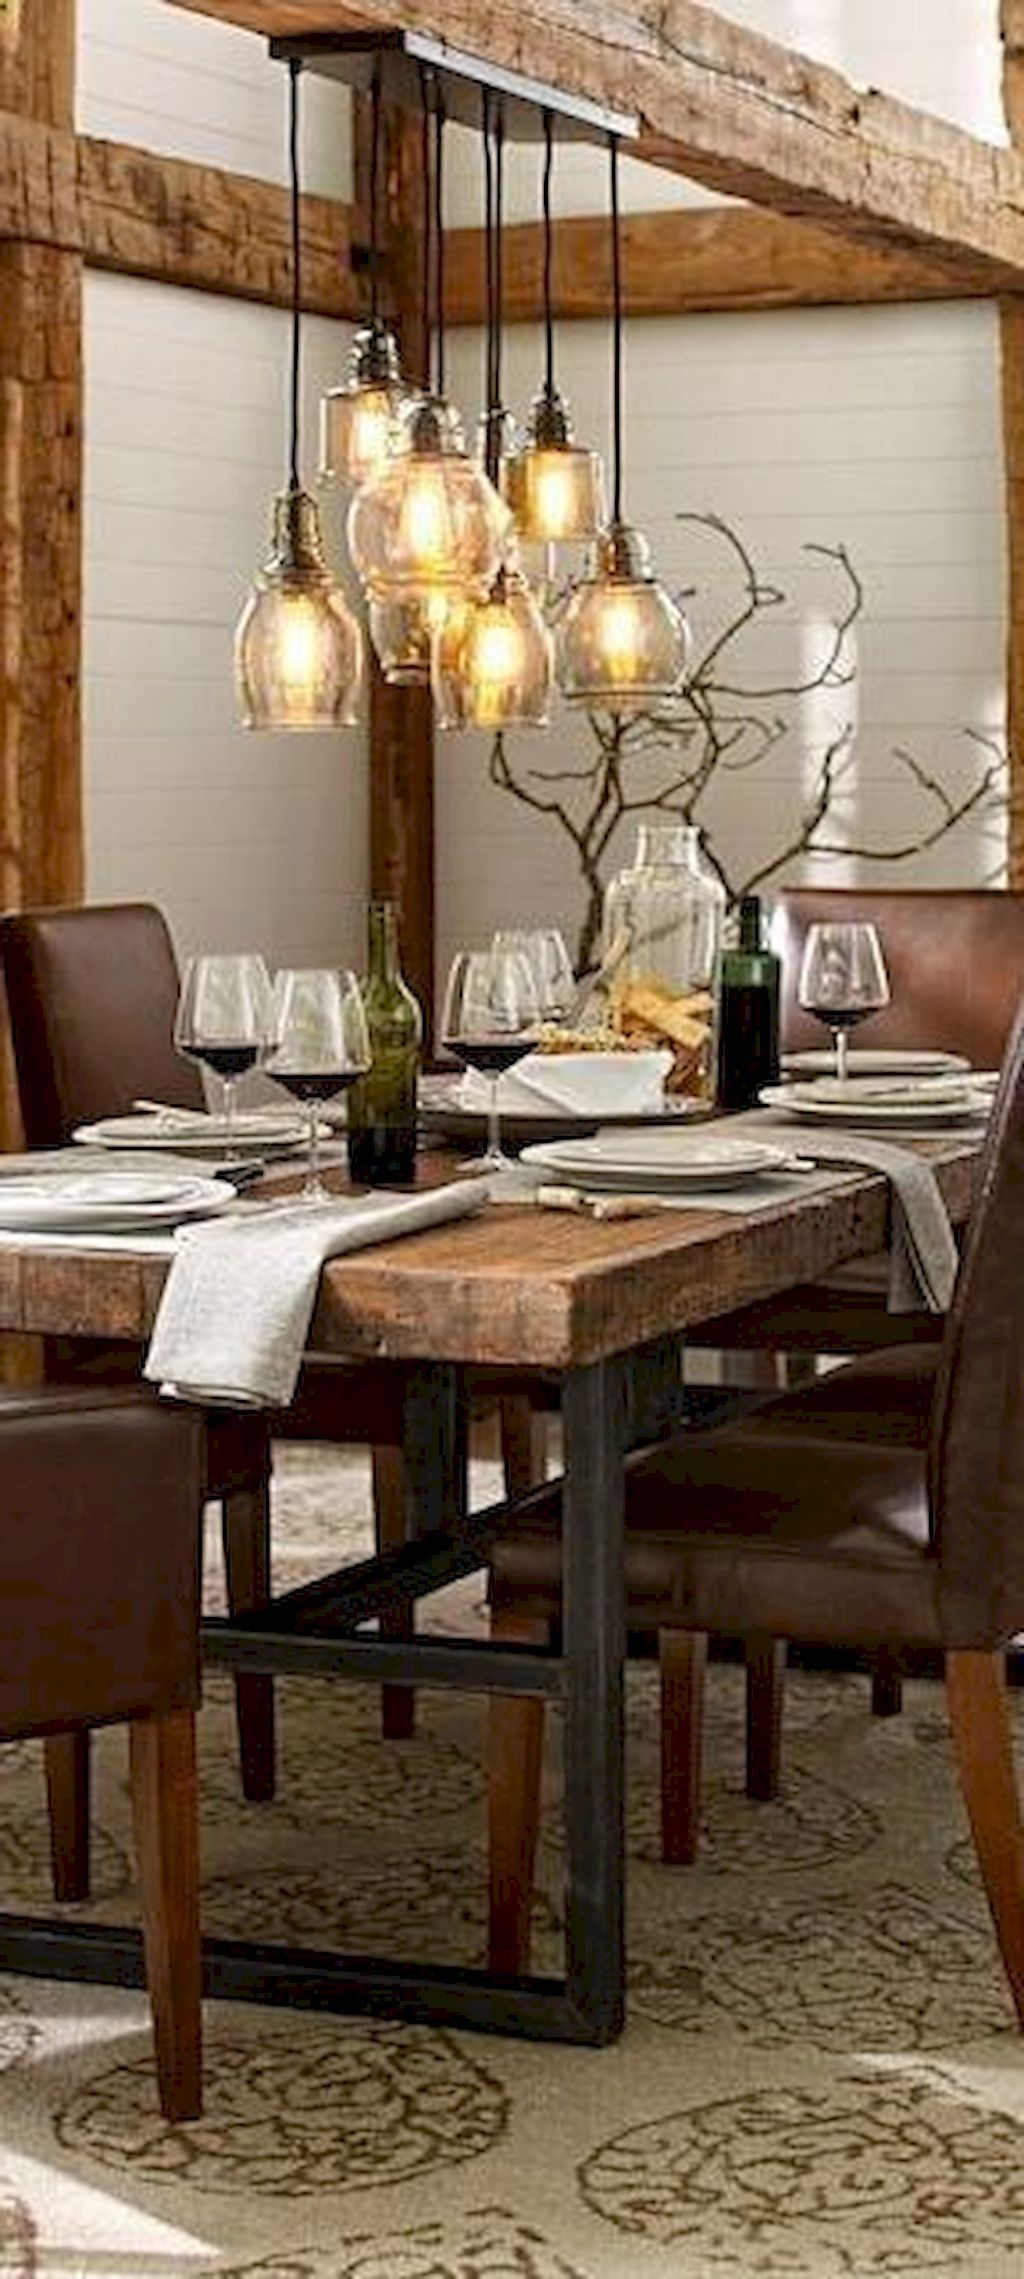 Dining Area Ideas 671740169359254381 In 2020 Modern Farmhouse Dining Room Farmhouse Dining Modern Farmhouse Dining Room Decor